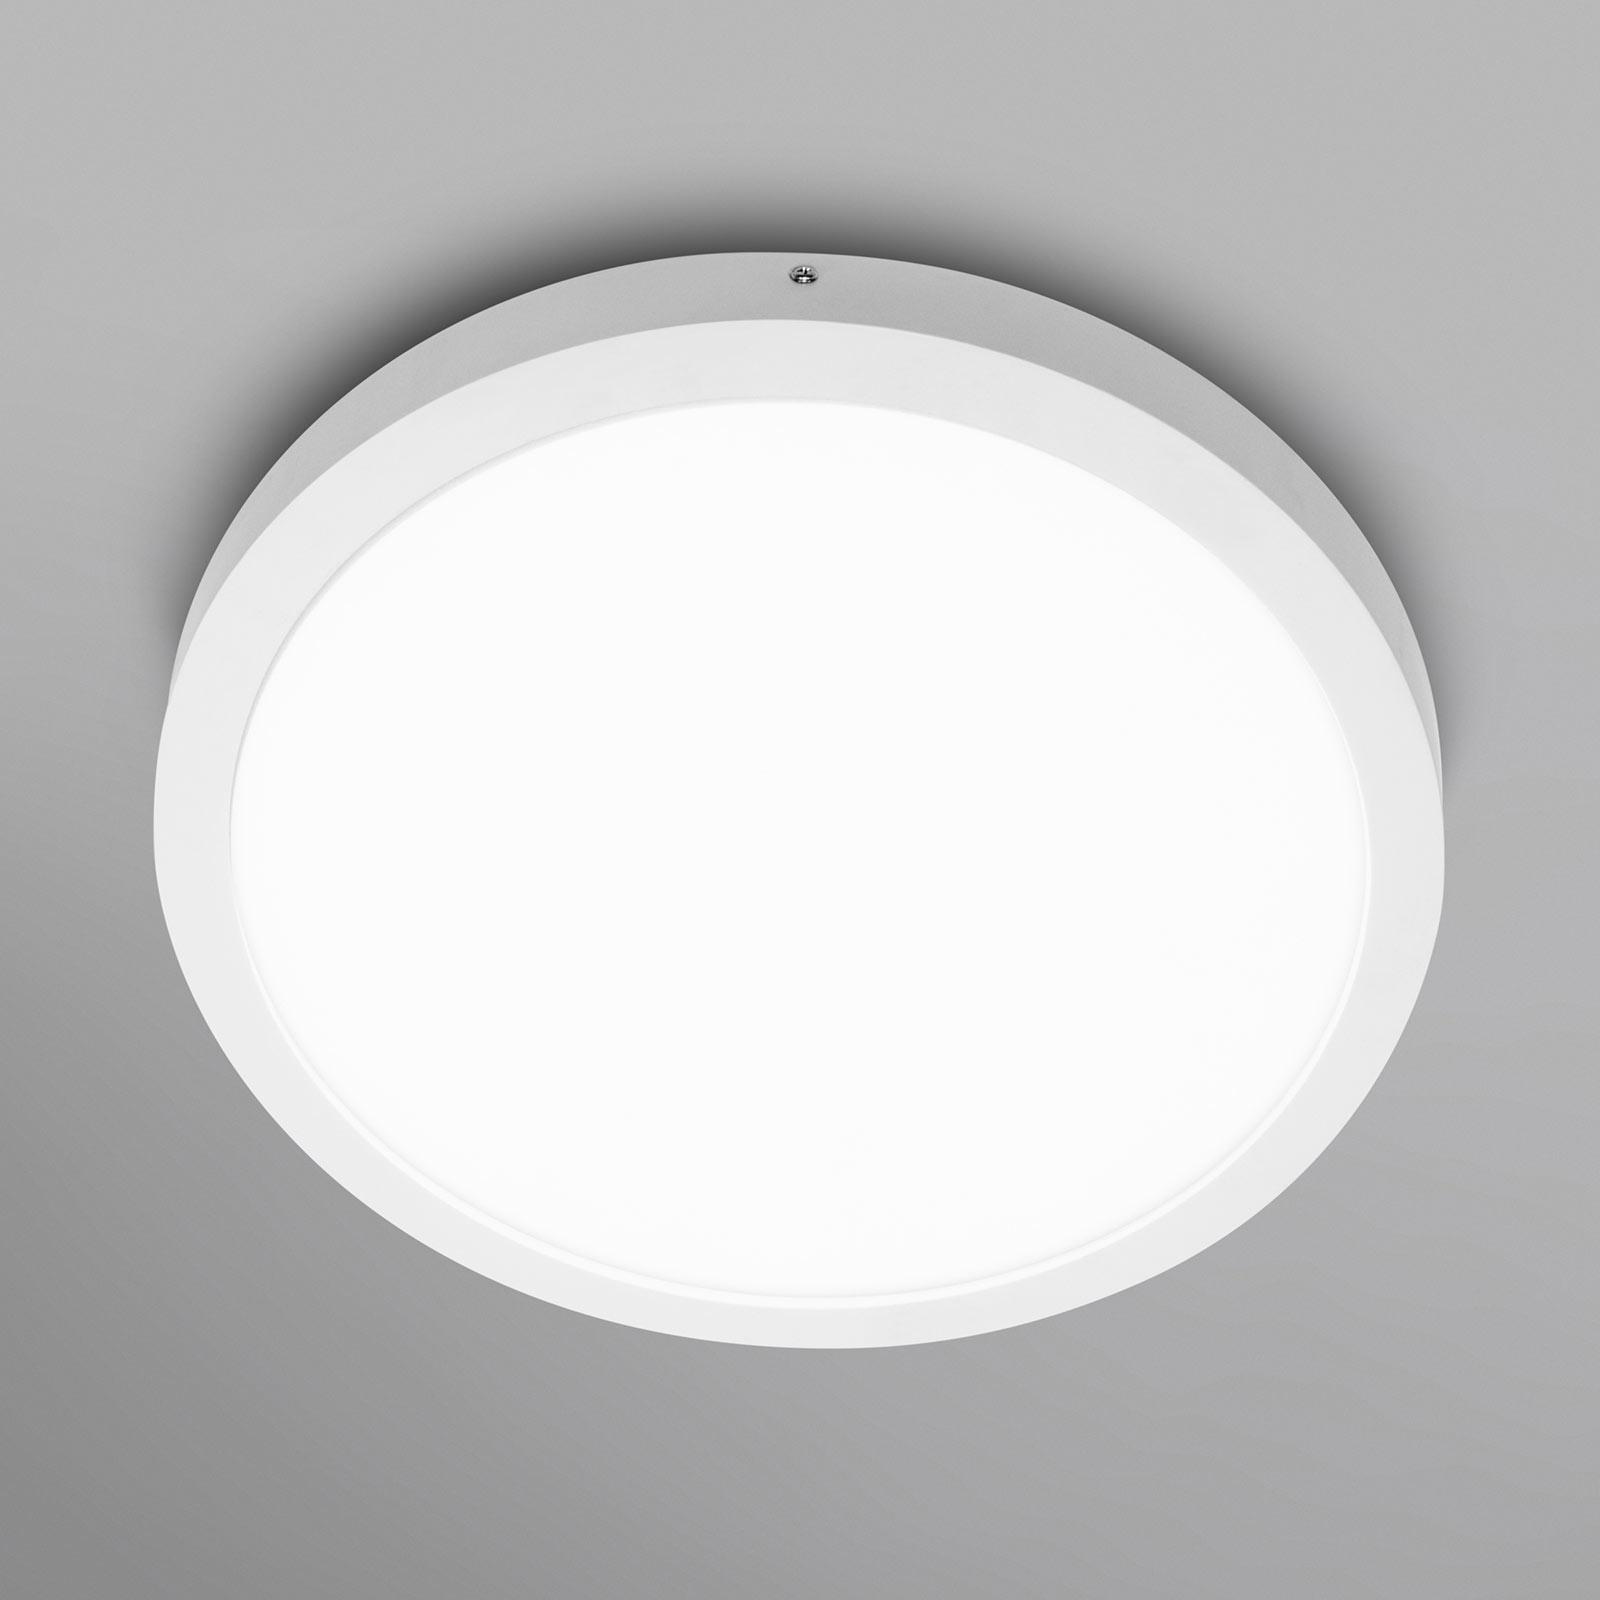 LEDVANCE Planon Round LED-vegglampe 40 cm 840